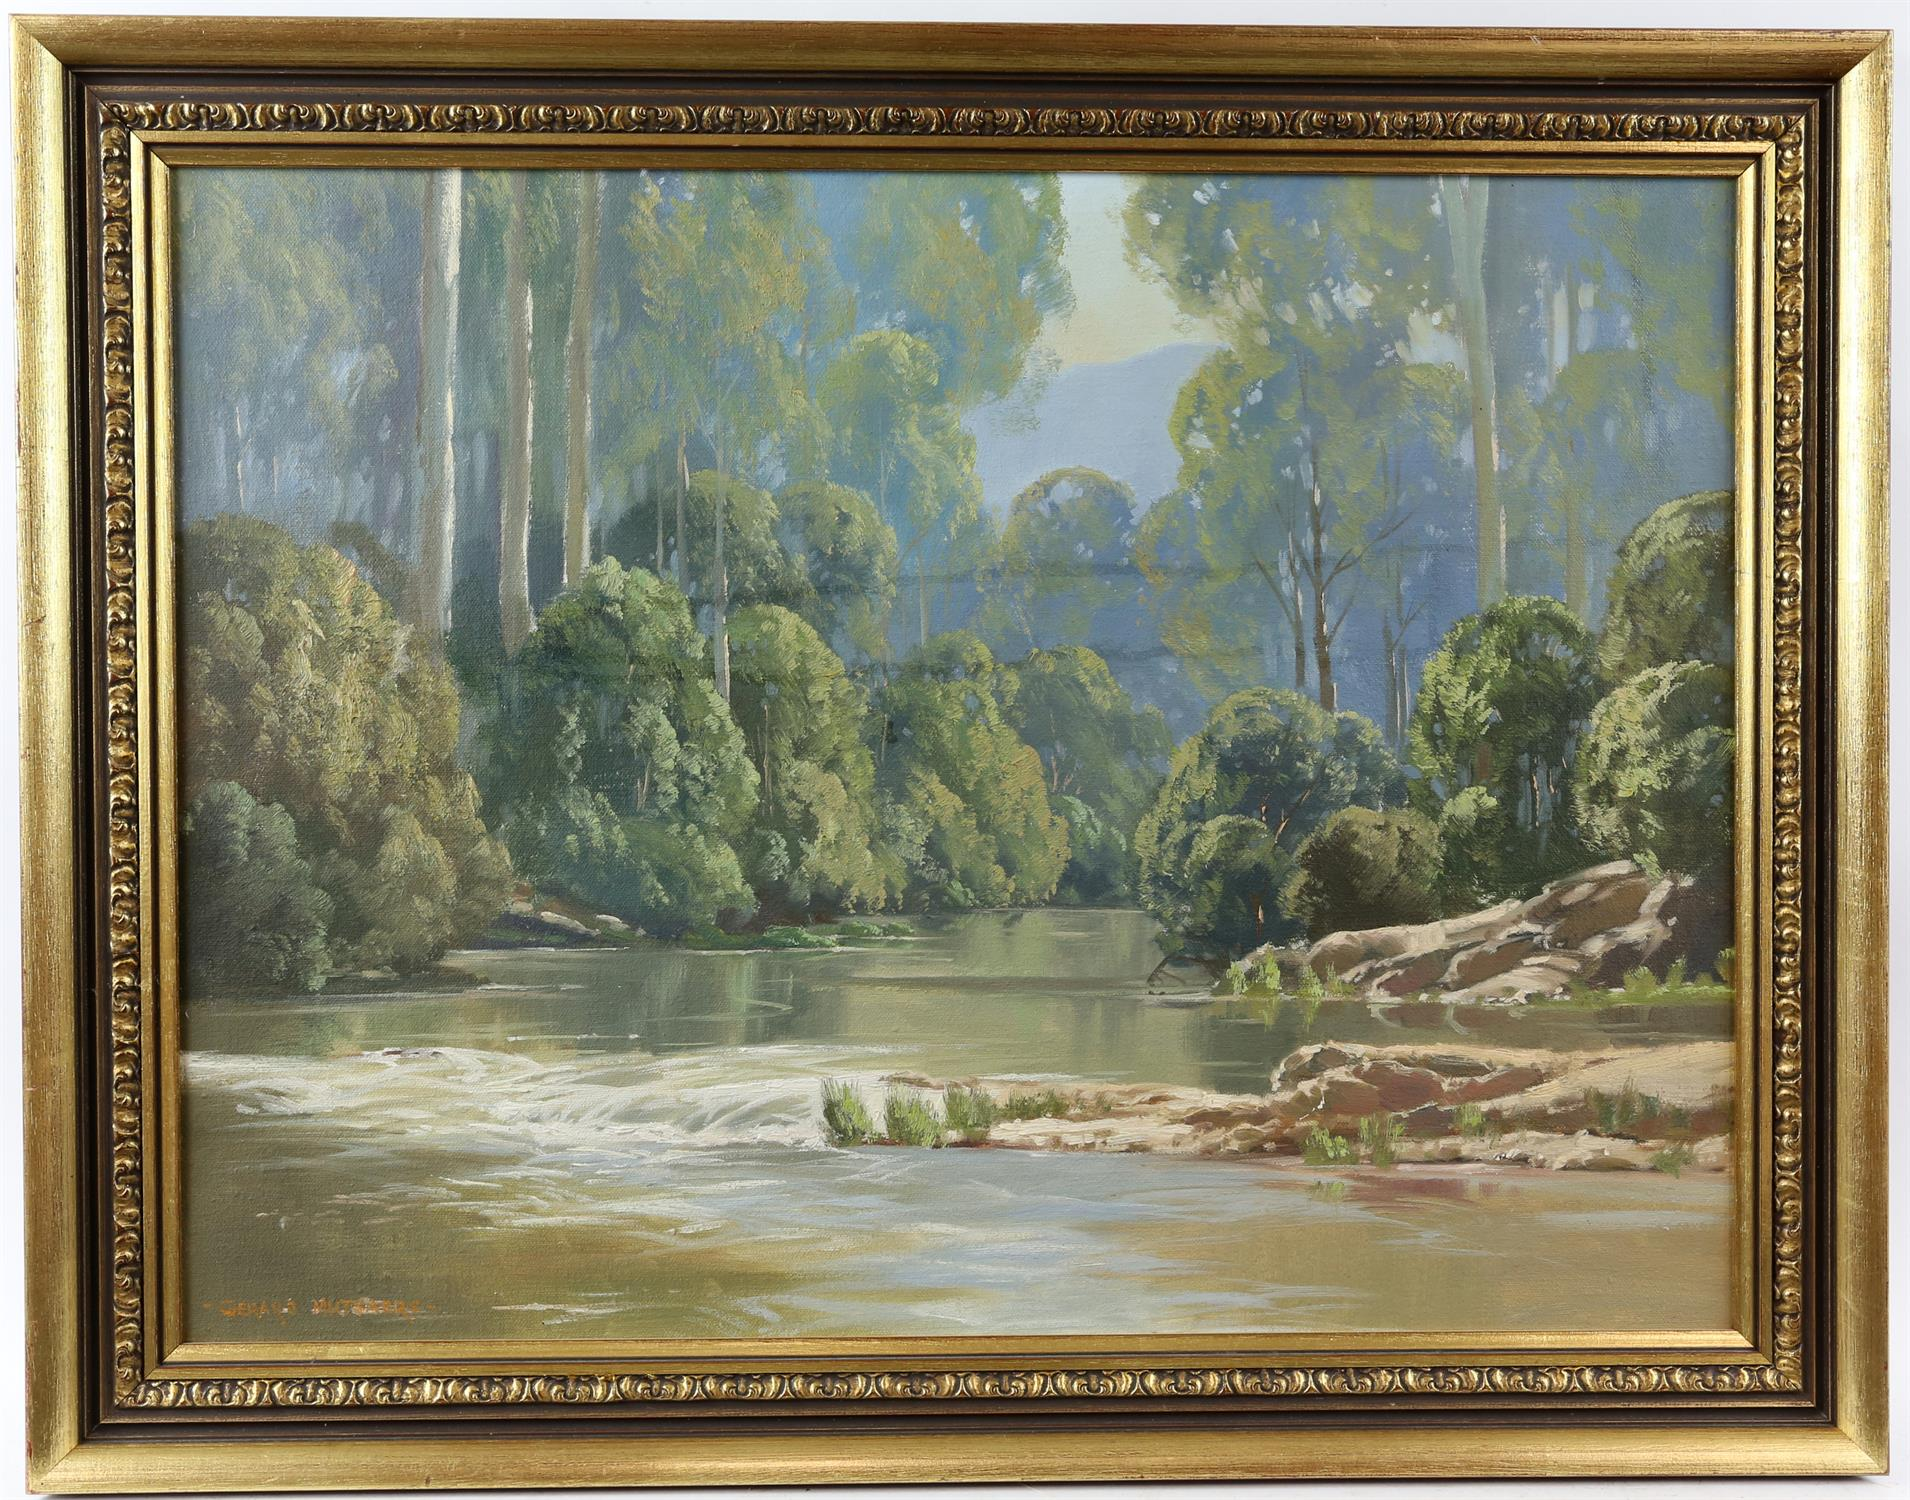 Gerard Mutsaers (Australian b. 1947), 'Morning Light, Yarra River, Warburton', signed, oil on board, - Image 2 of 4